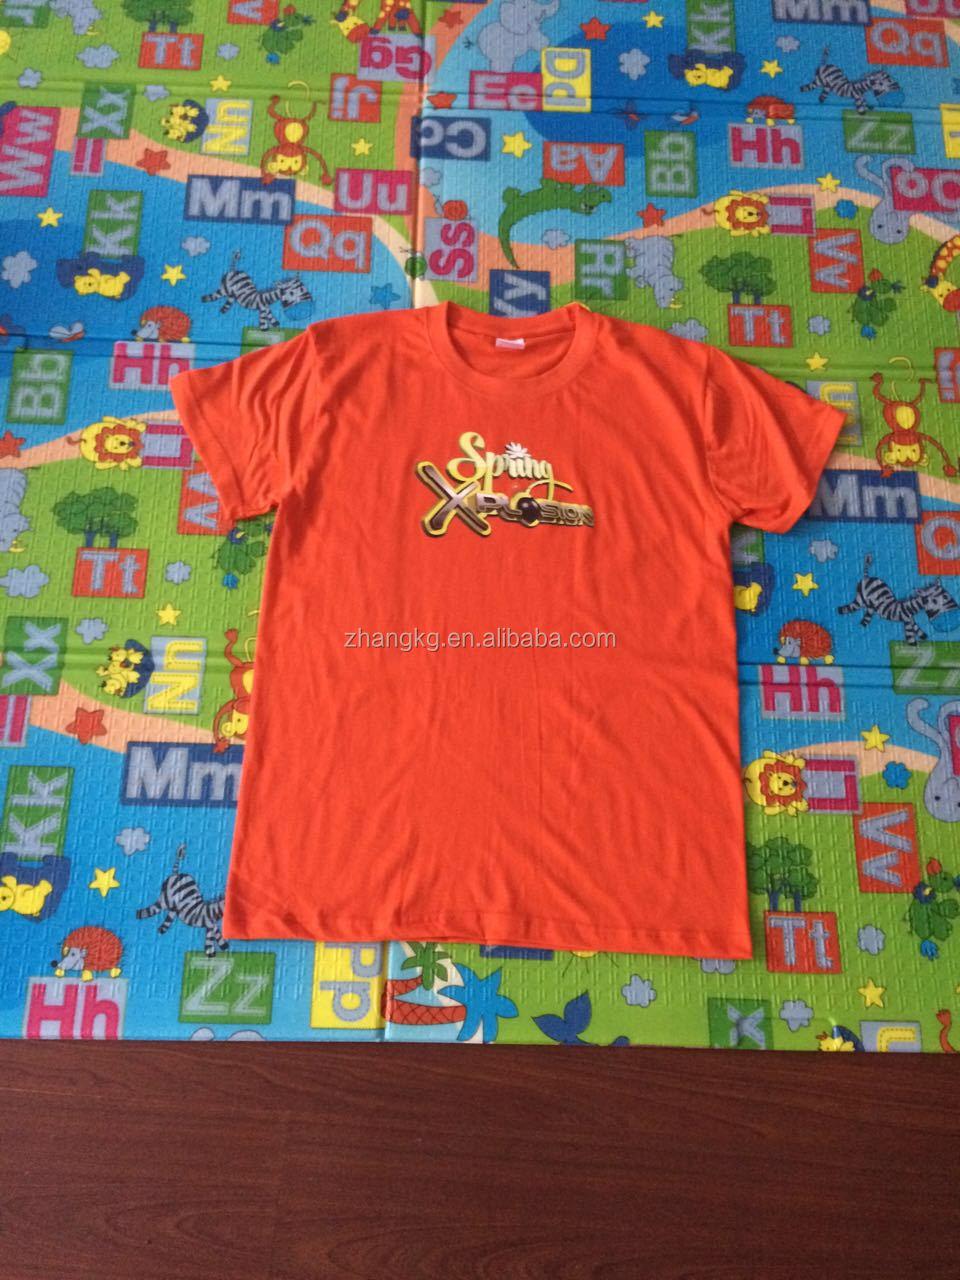 Nice quality heat pressed t shirts all kinds of colors t for Heat pressed t shirts